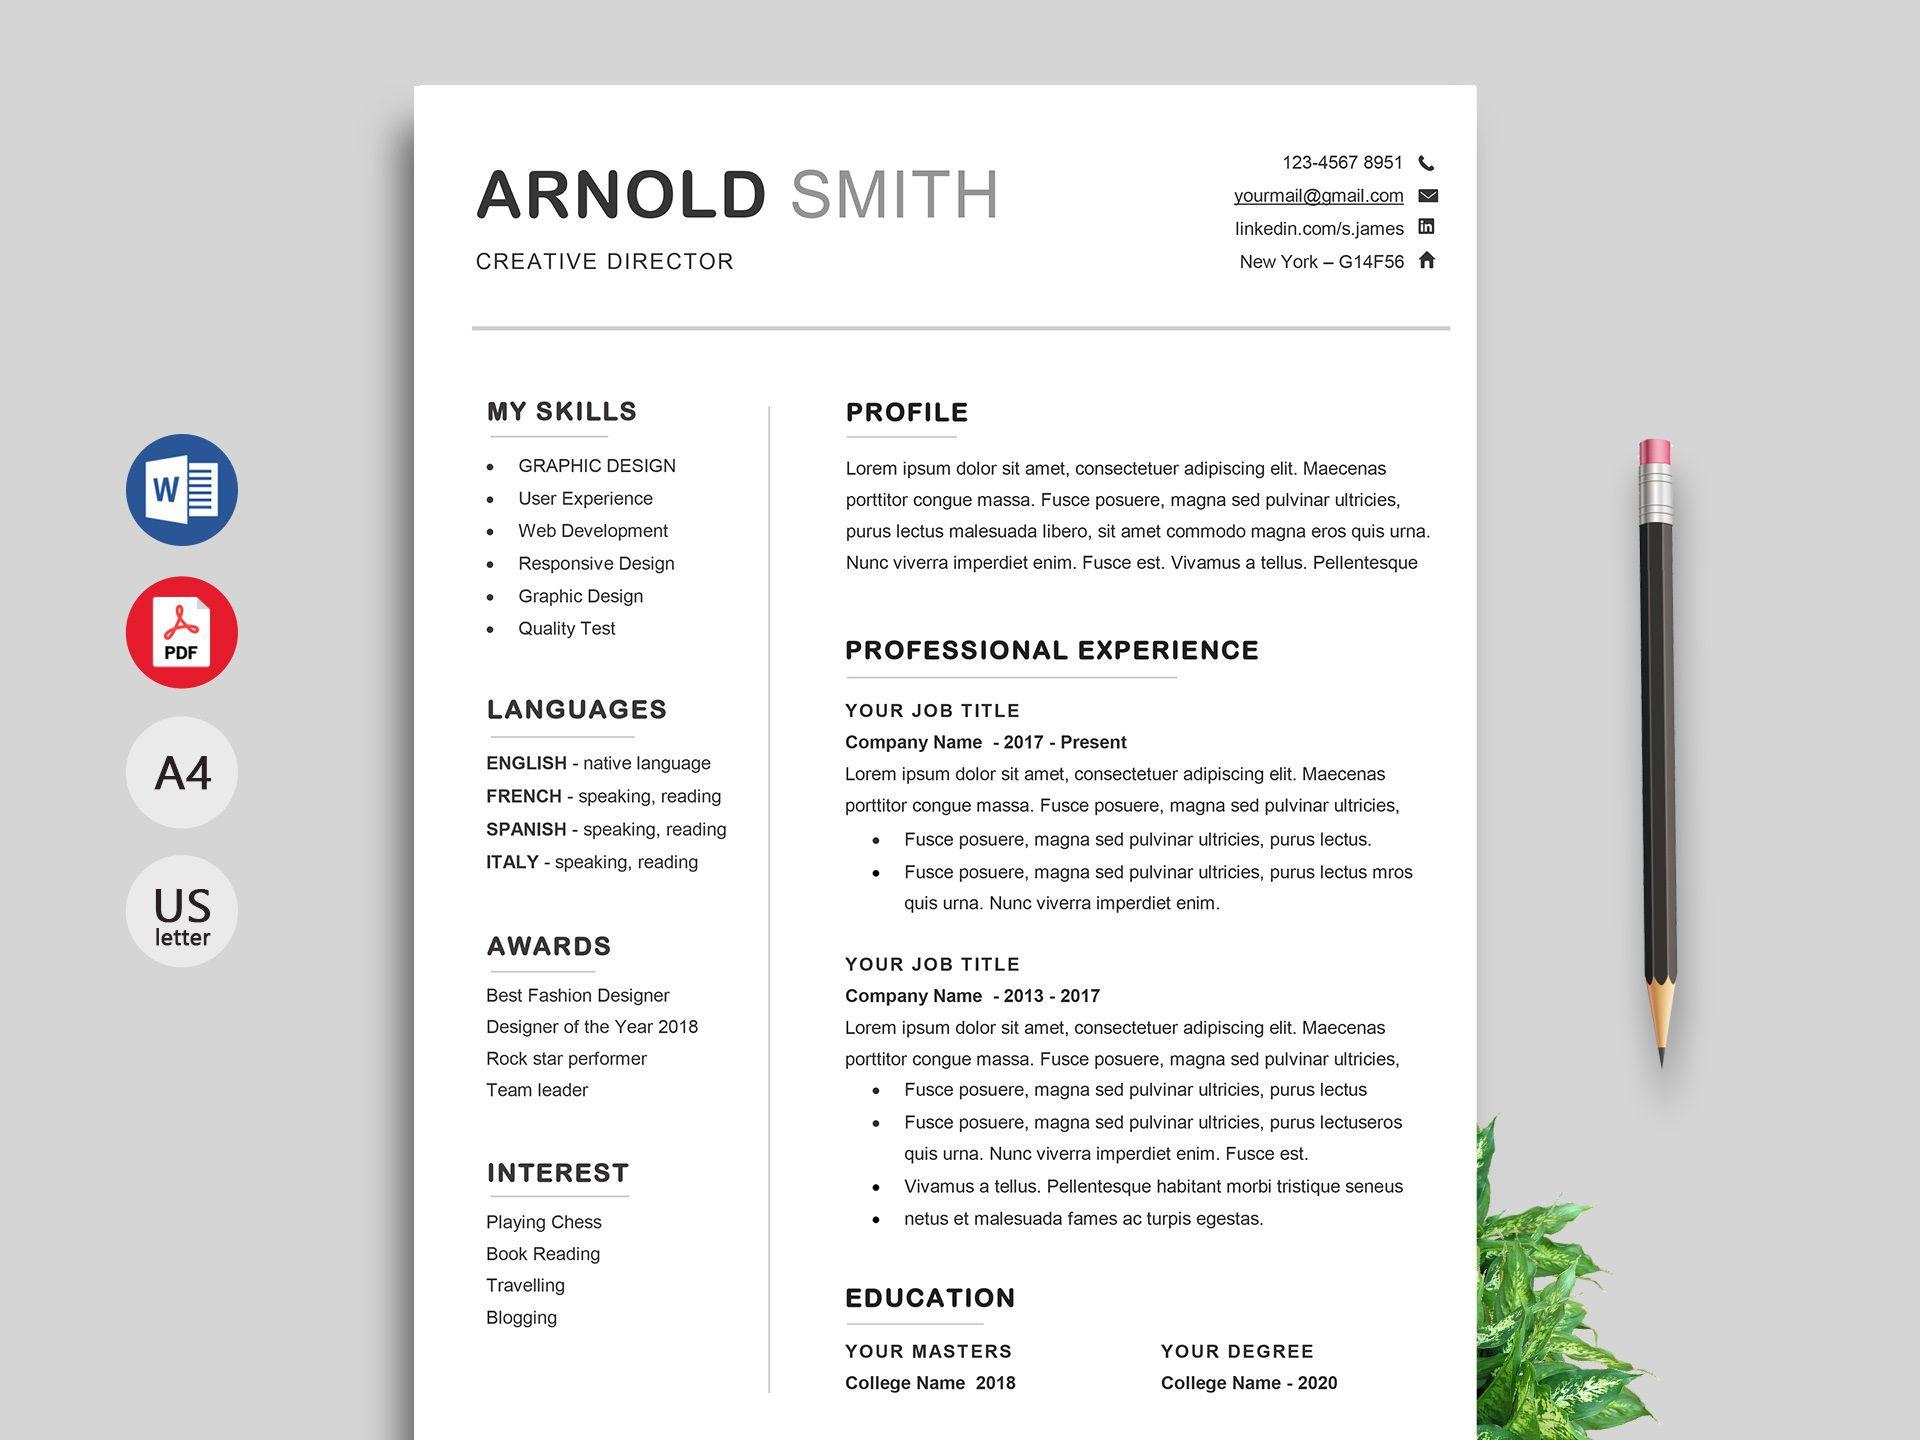 003 Fascinating Resume Template For Free Example  Best Word Freelance Writer MicrosoftFull